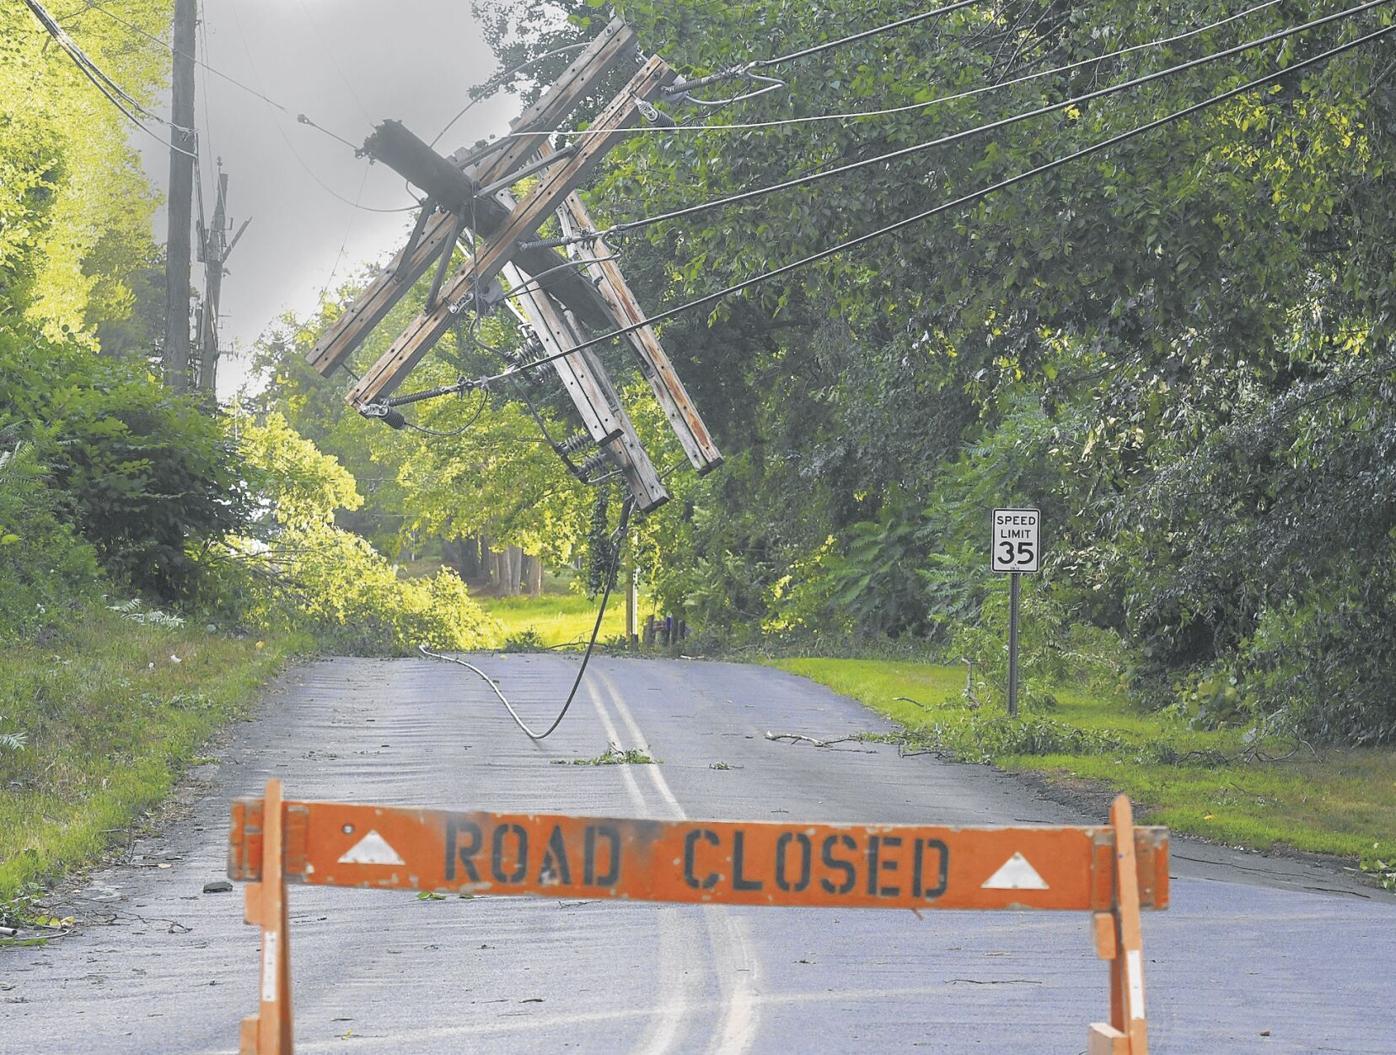 Dangling utility pole in East Windsor